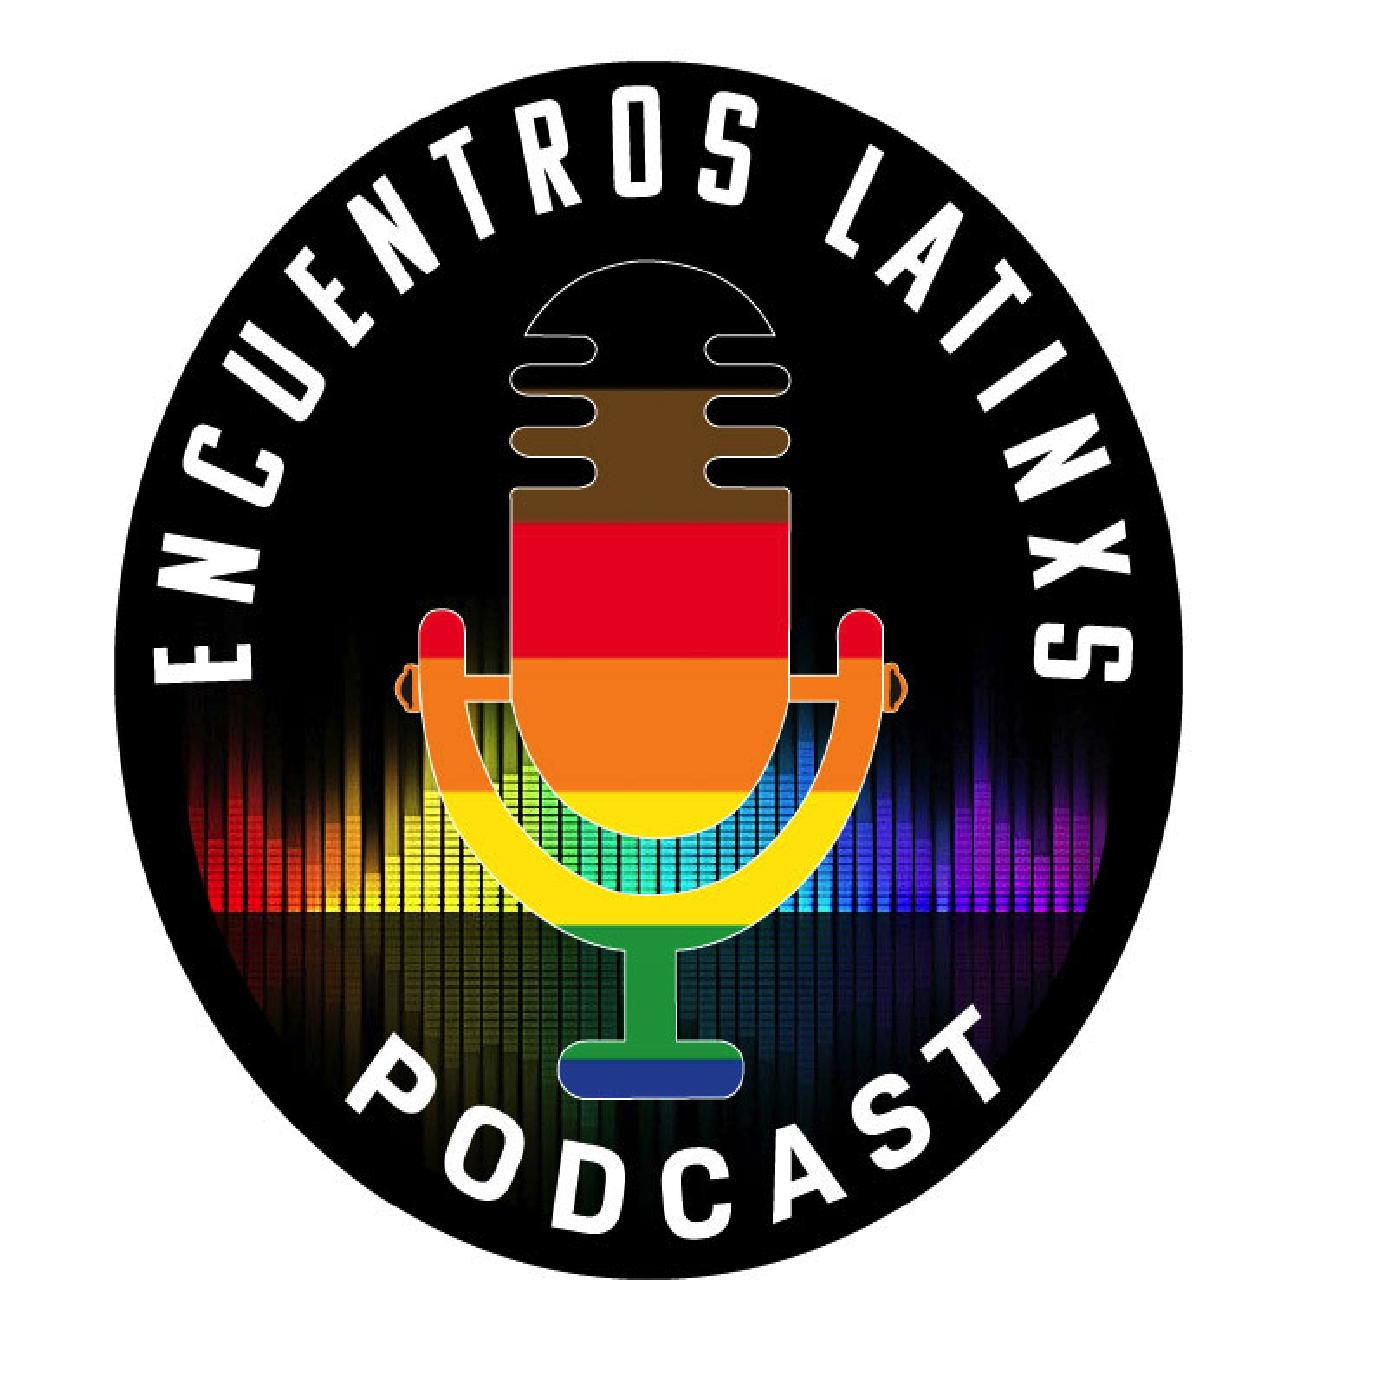 Encuentro Latinxs podcast logo